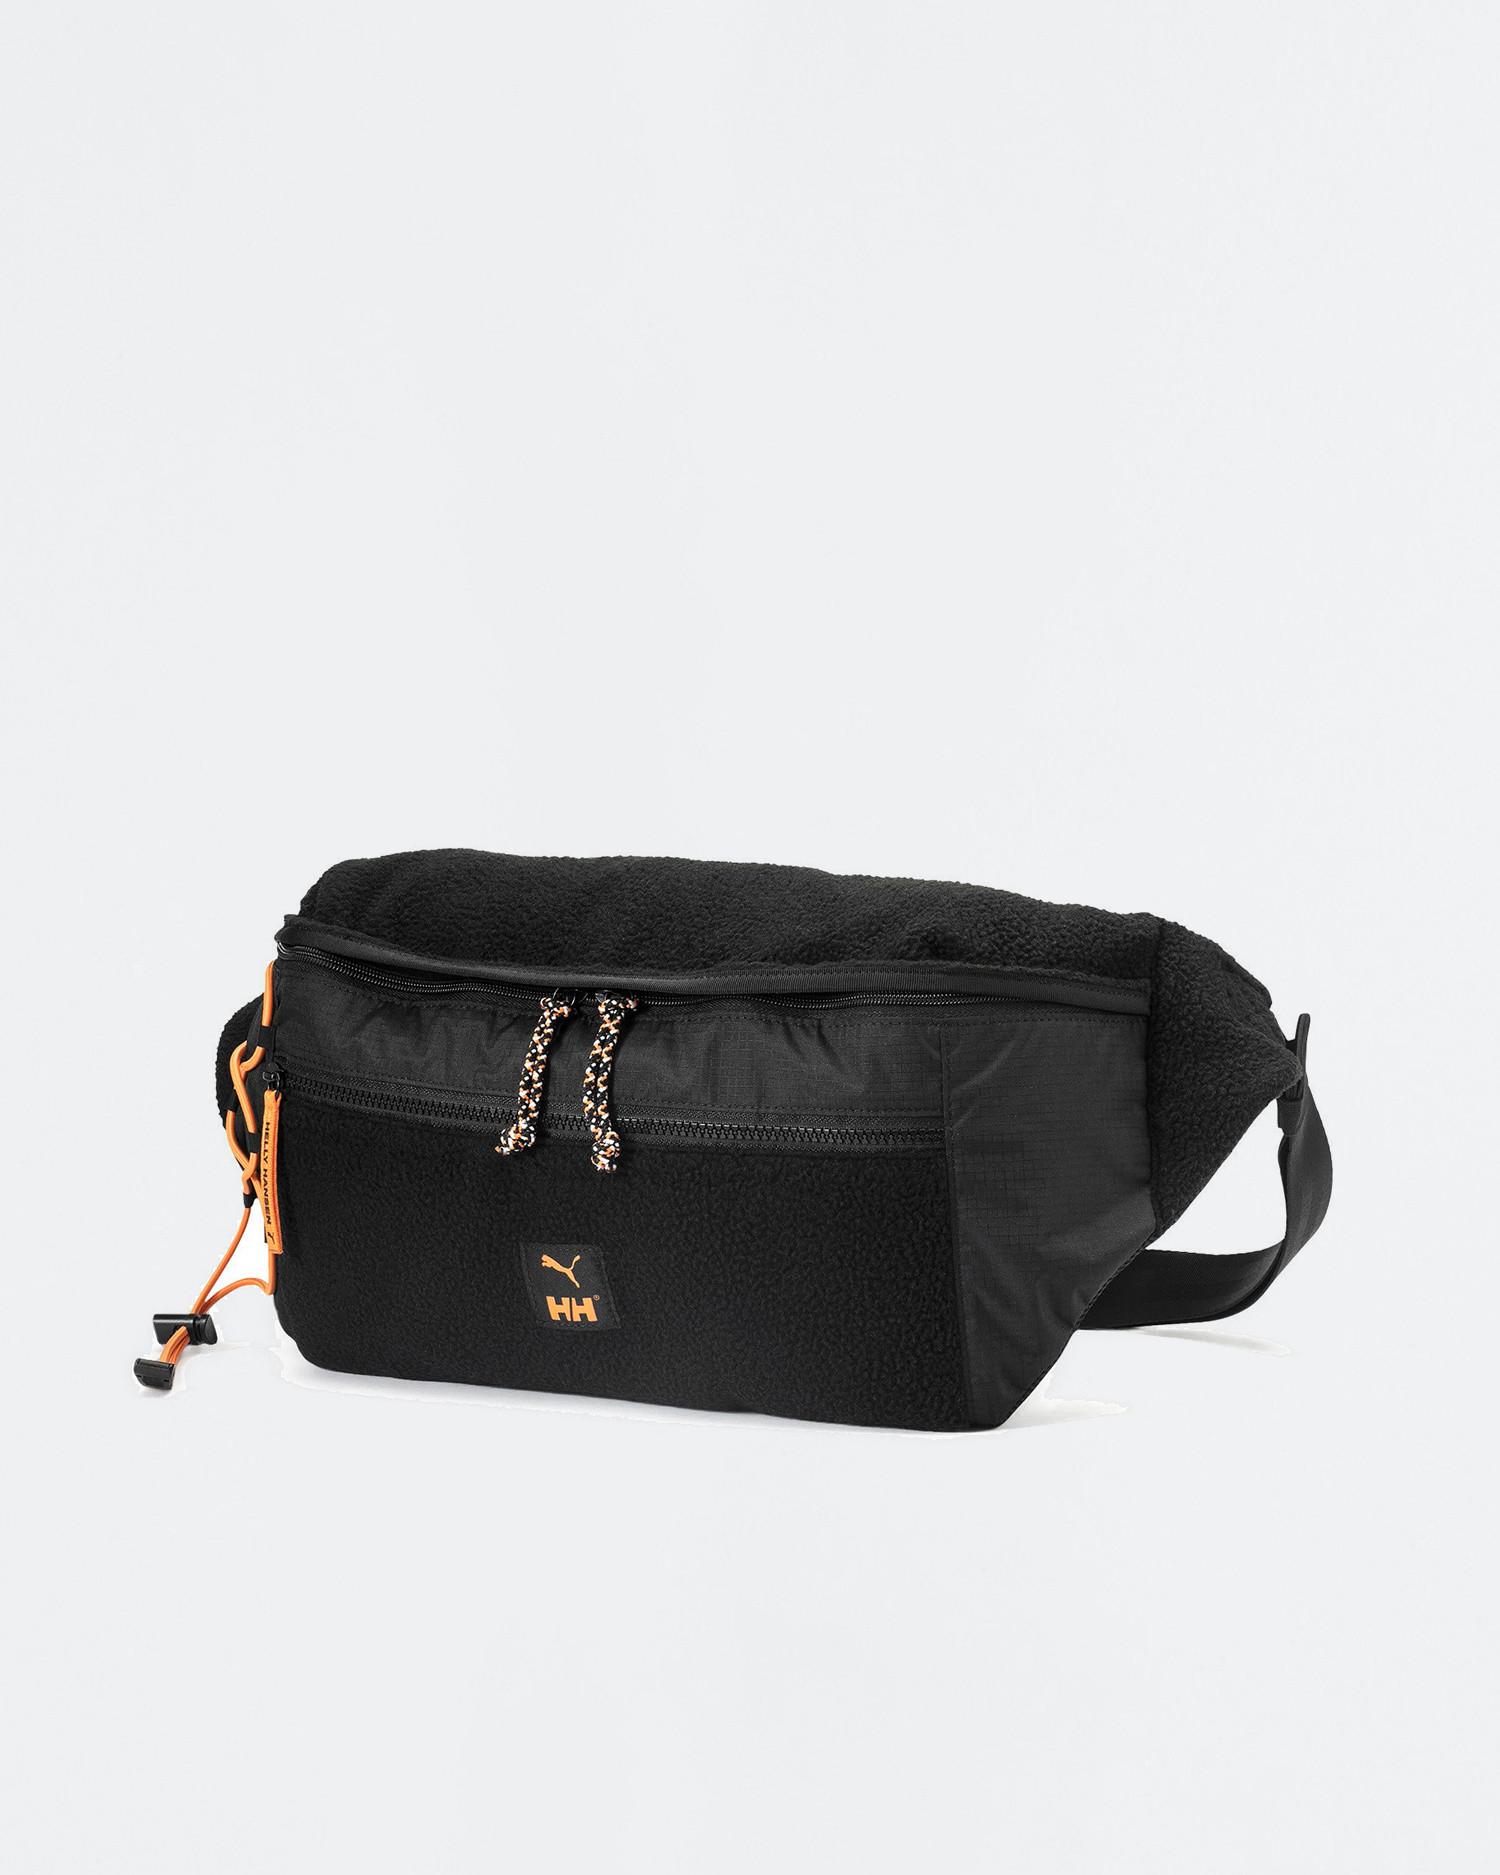 Puma x Helly Hansen Oversized waistbag Black